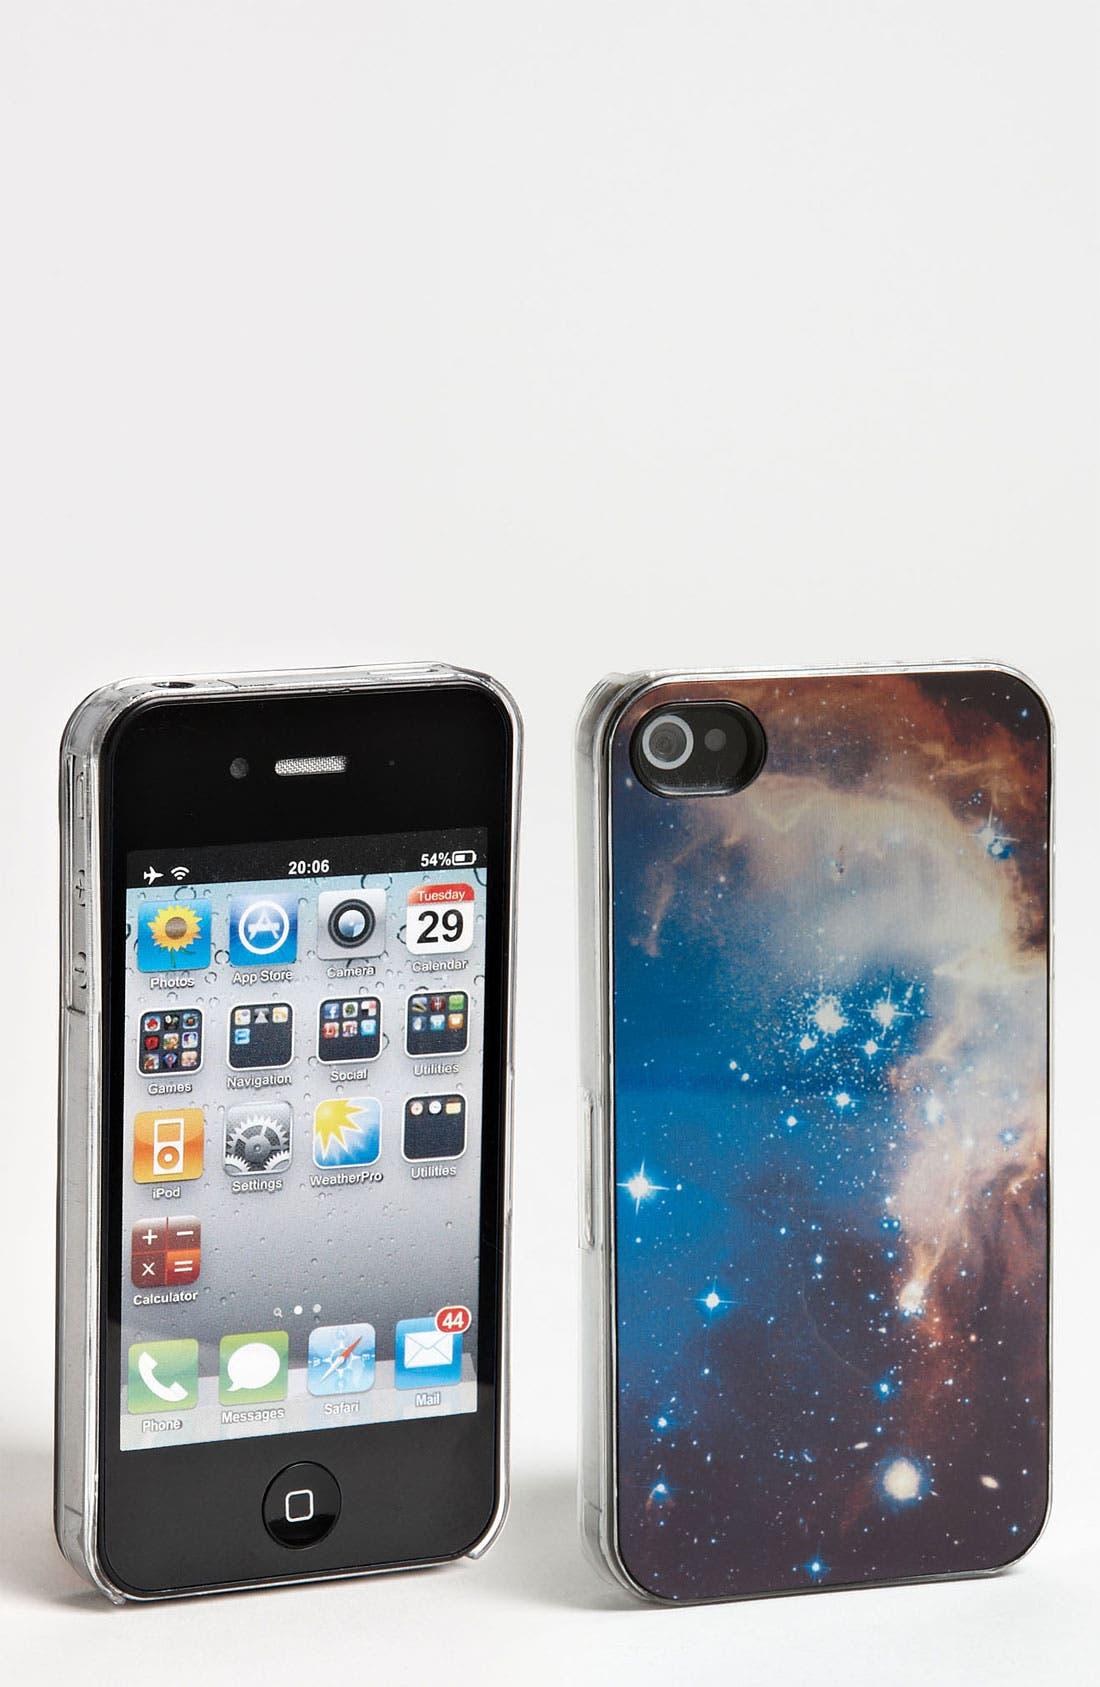 Main Image - ZERO GRAVITY 'Space' iPhone 4 & 4S Case